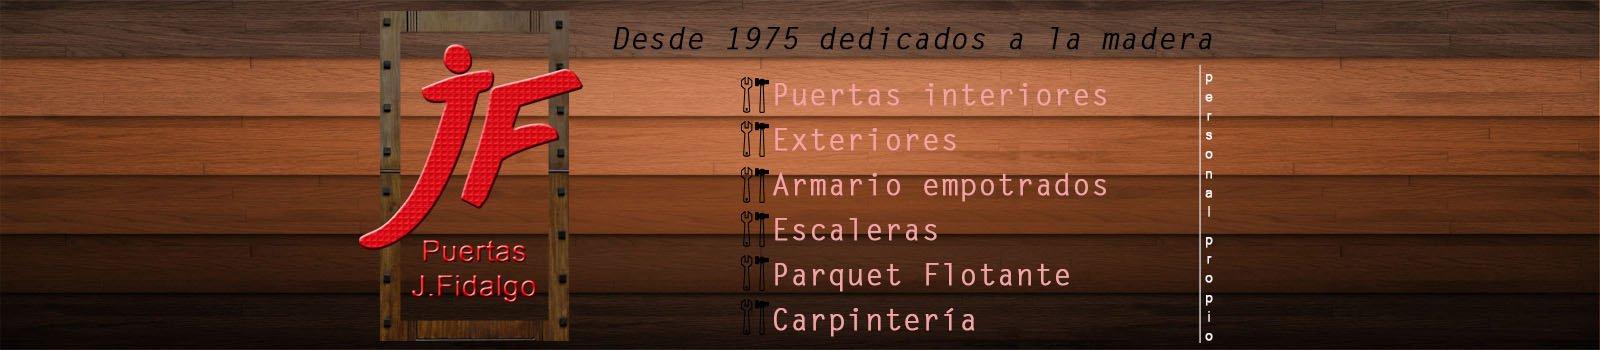 Ebanistería en Valladolid, Ebanistería puertas j.fidalgo, Carpintería de madera